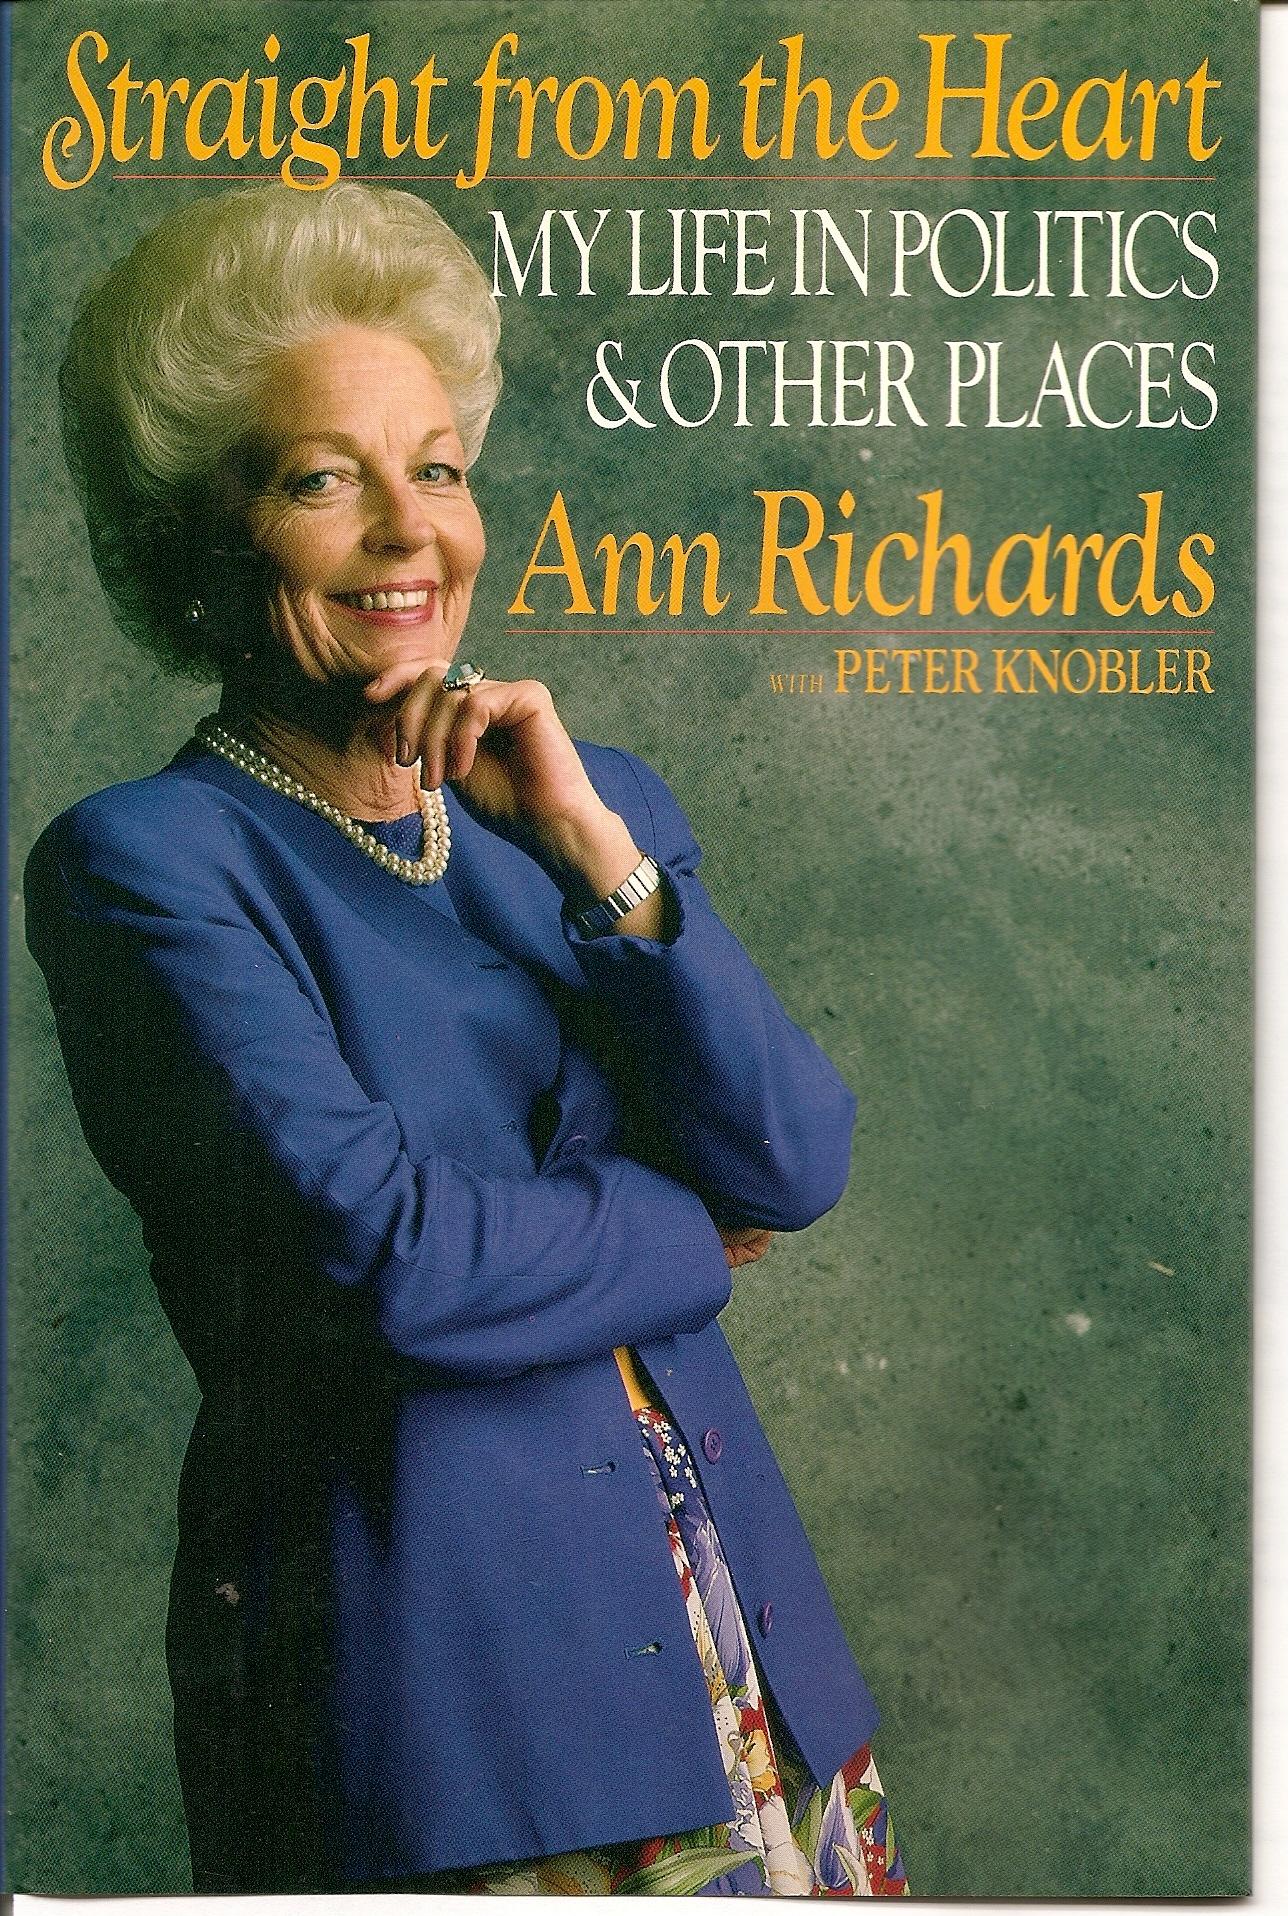 ann richards death